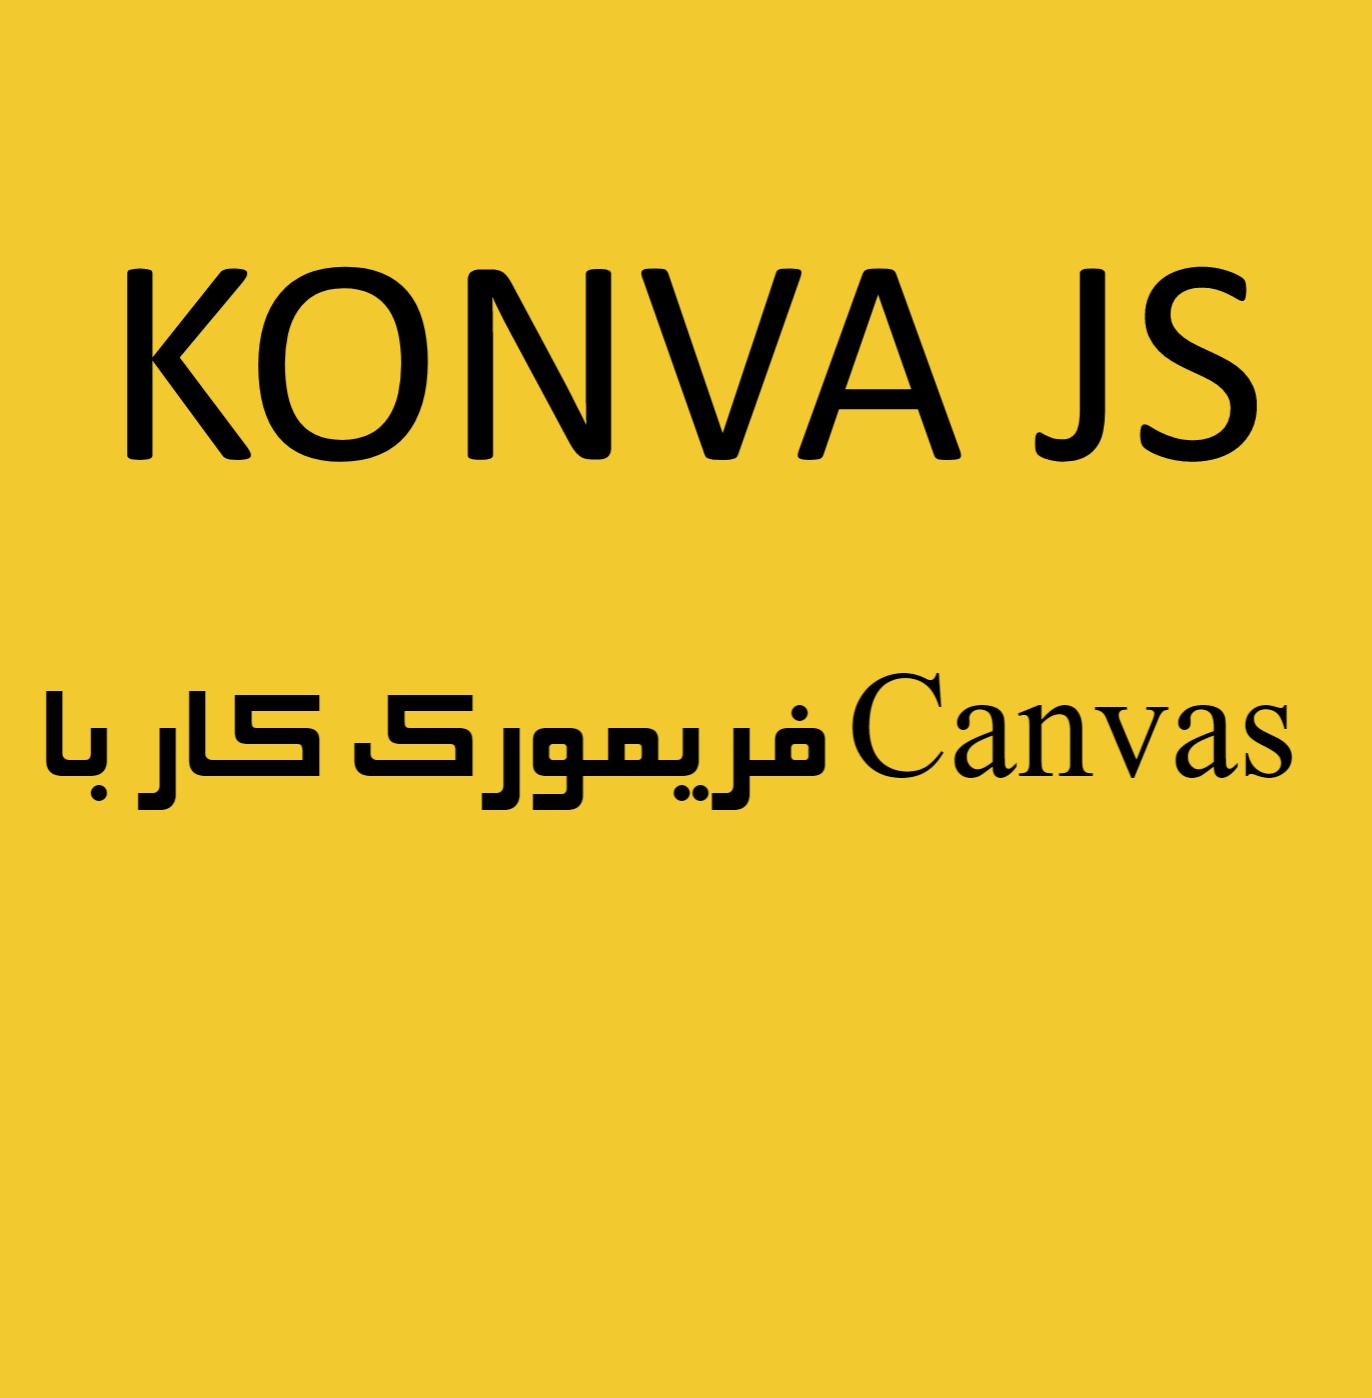 KONVA JS چیست وچه کاربرد های دارد ؟